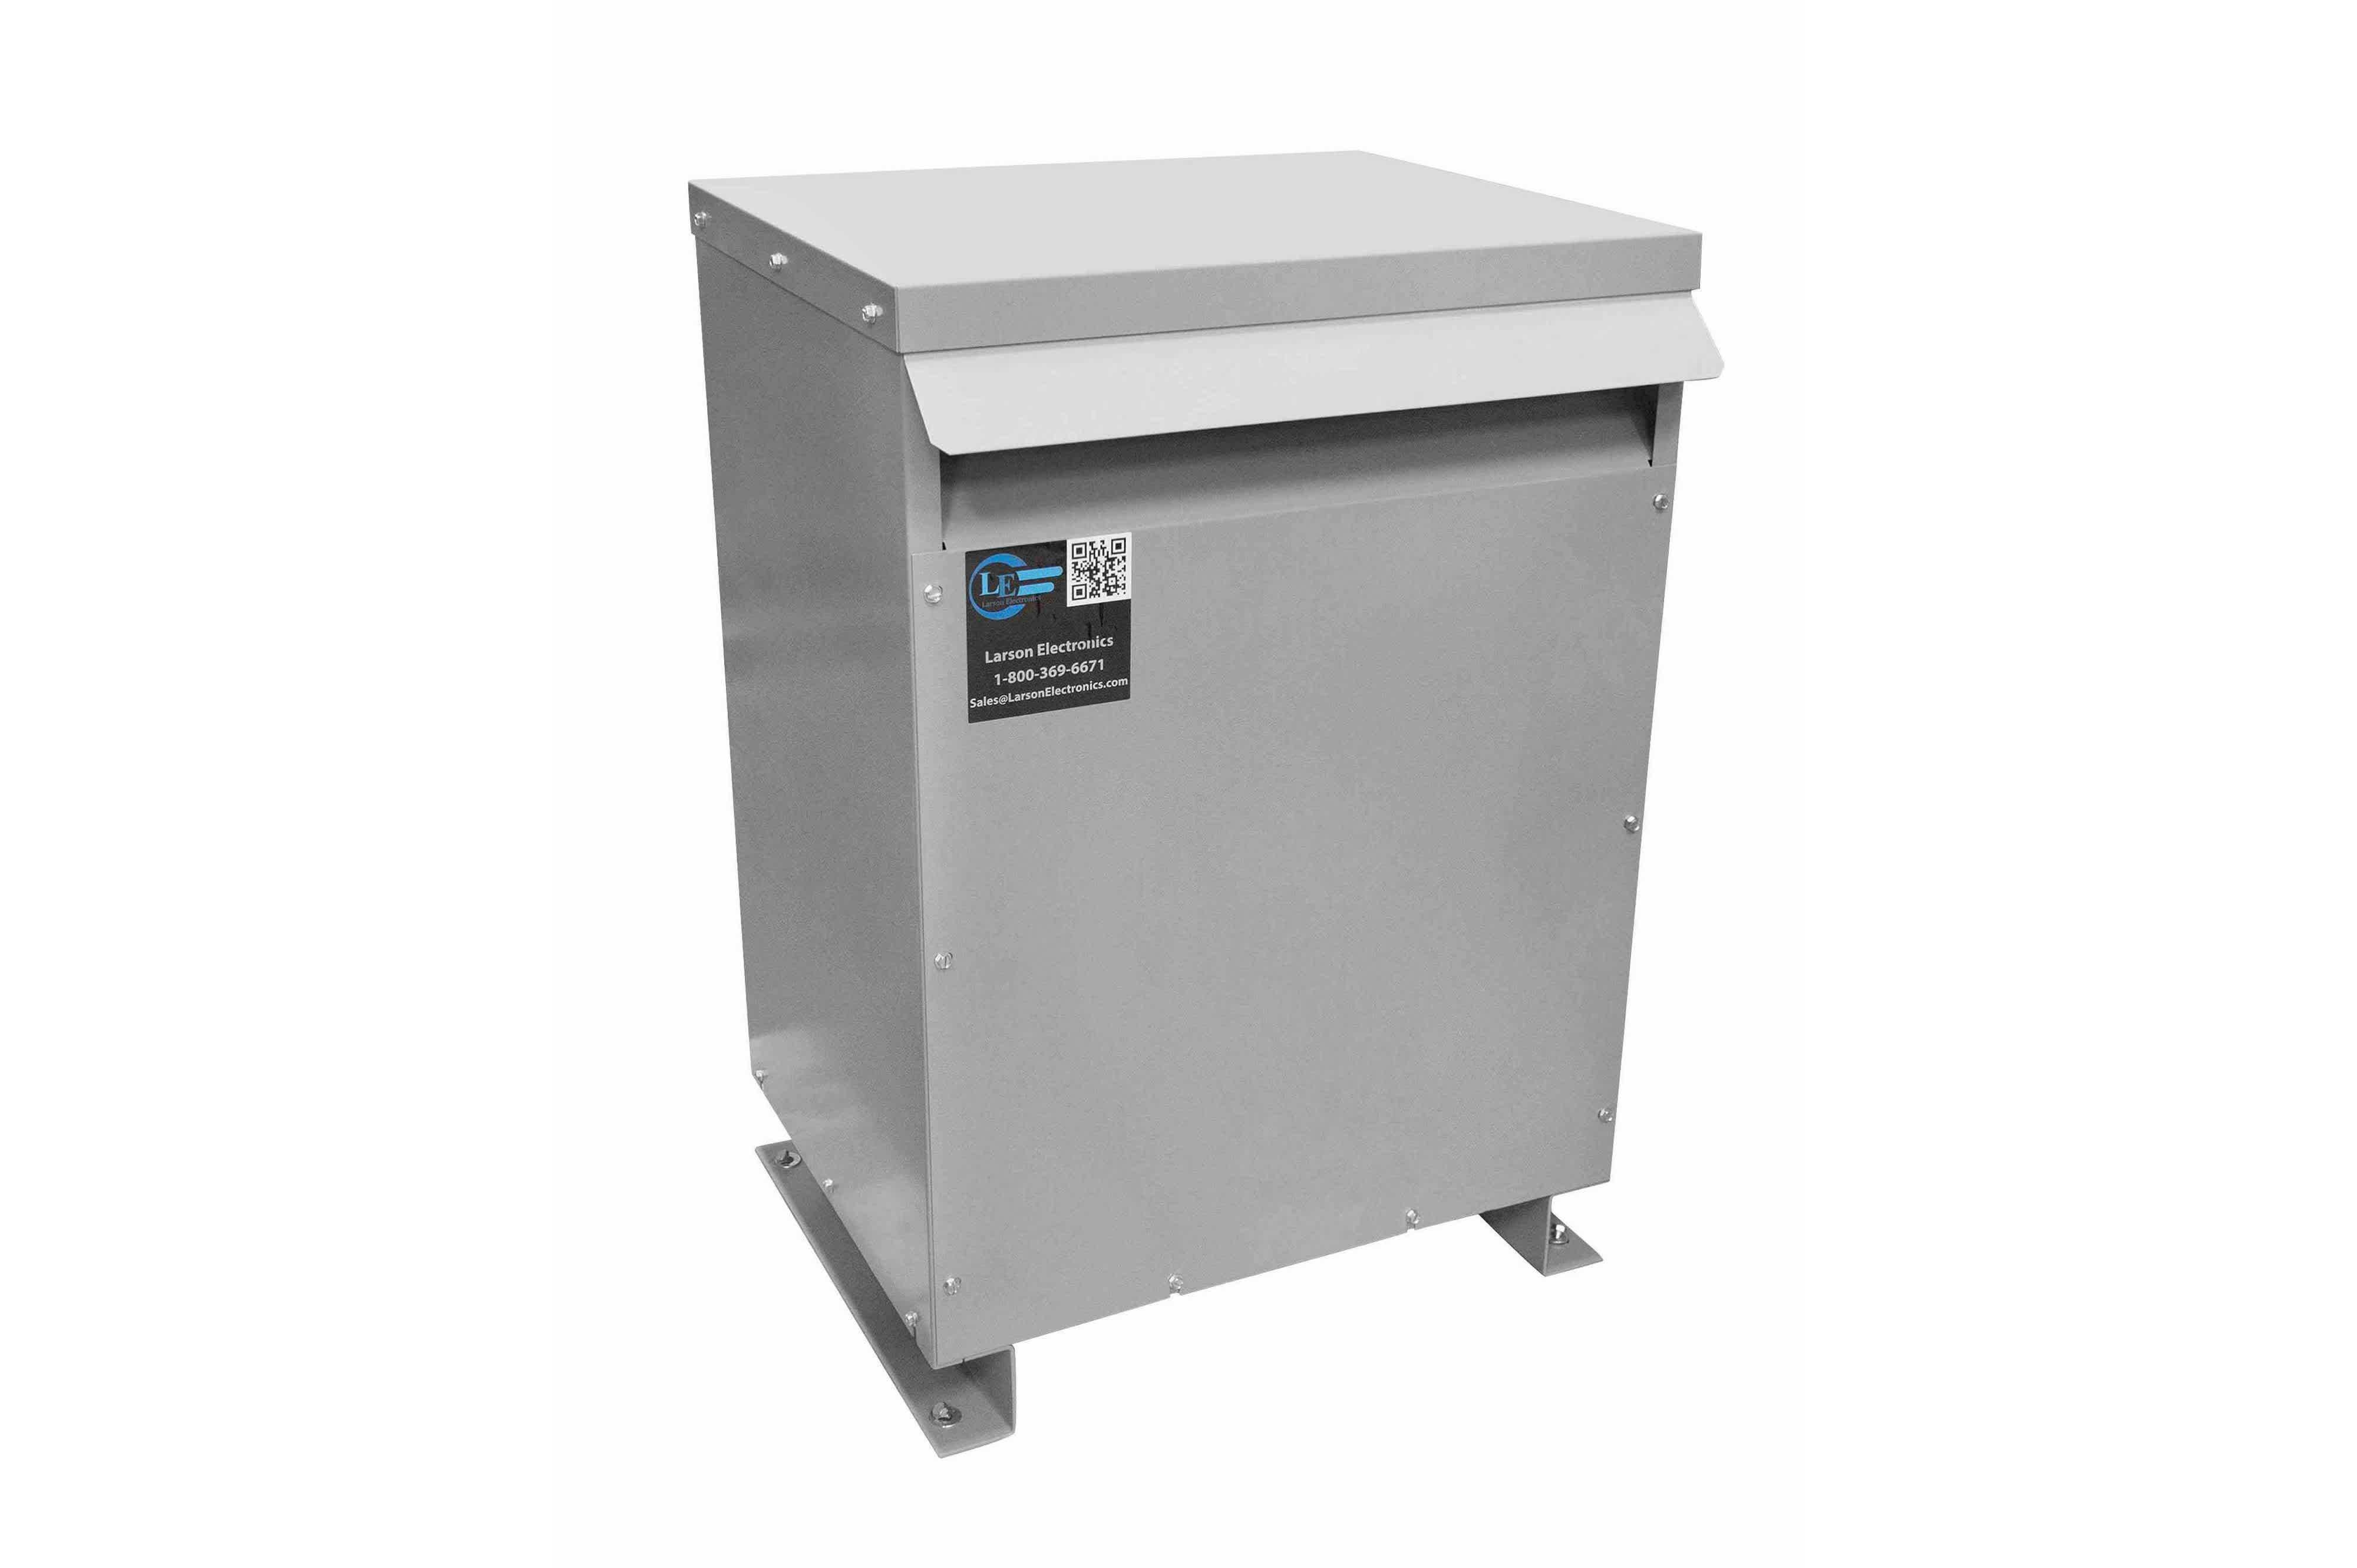 750 kVA 3PH Isolation Transformer, 480V Wye Primary, 575V Delta Secondary, N3R, Ventilated, 60 Hz